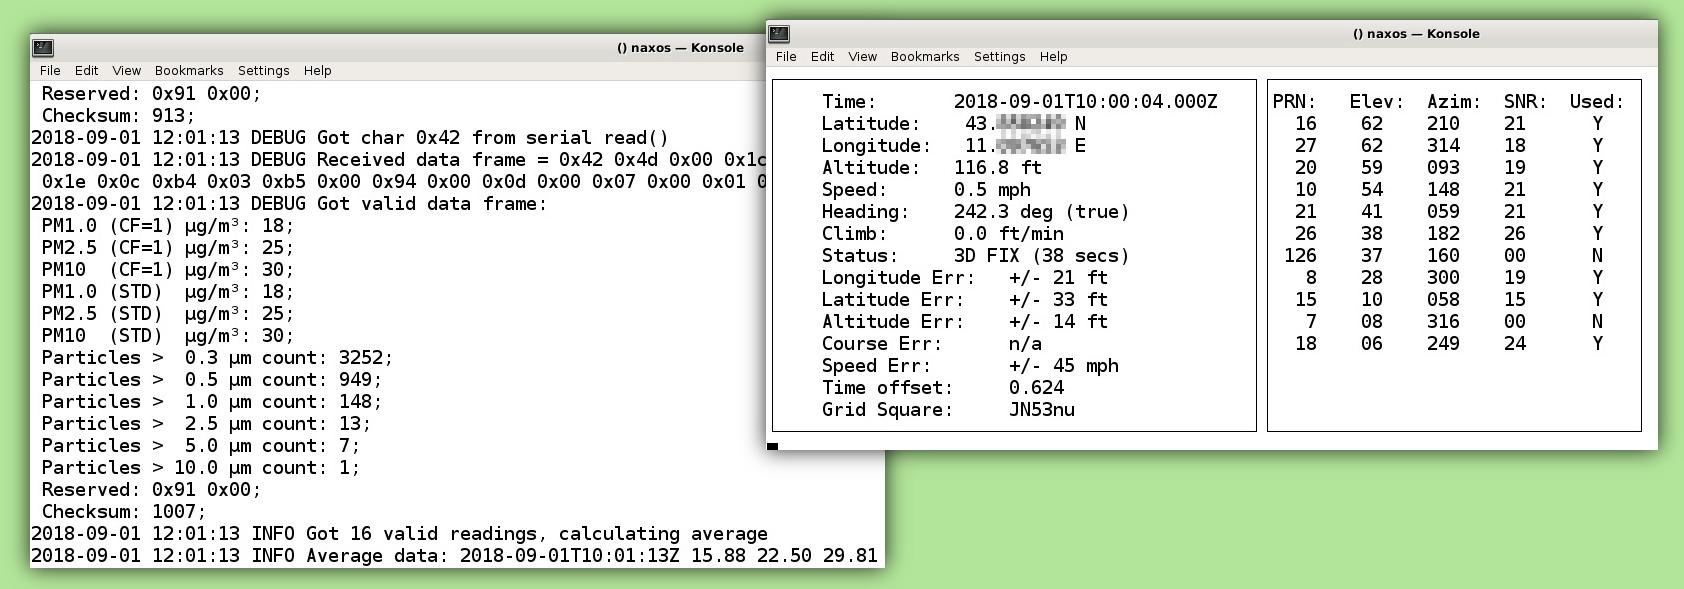 Rapsberry Pi Air Quality Station - Ham Radio - Hackers - Makers